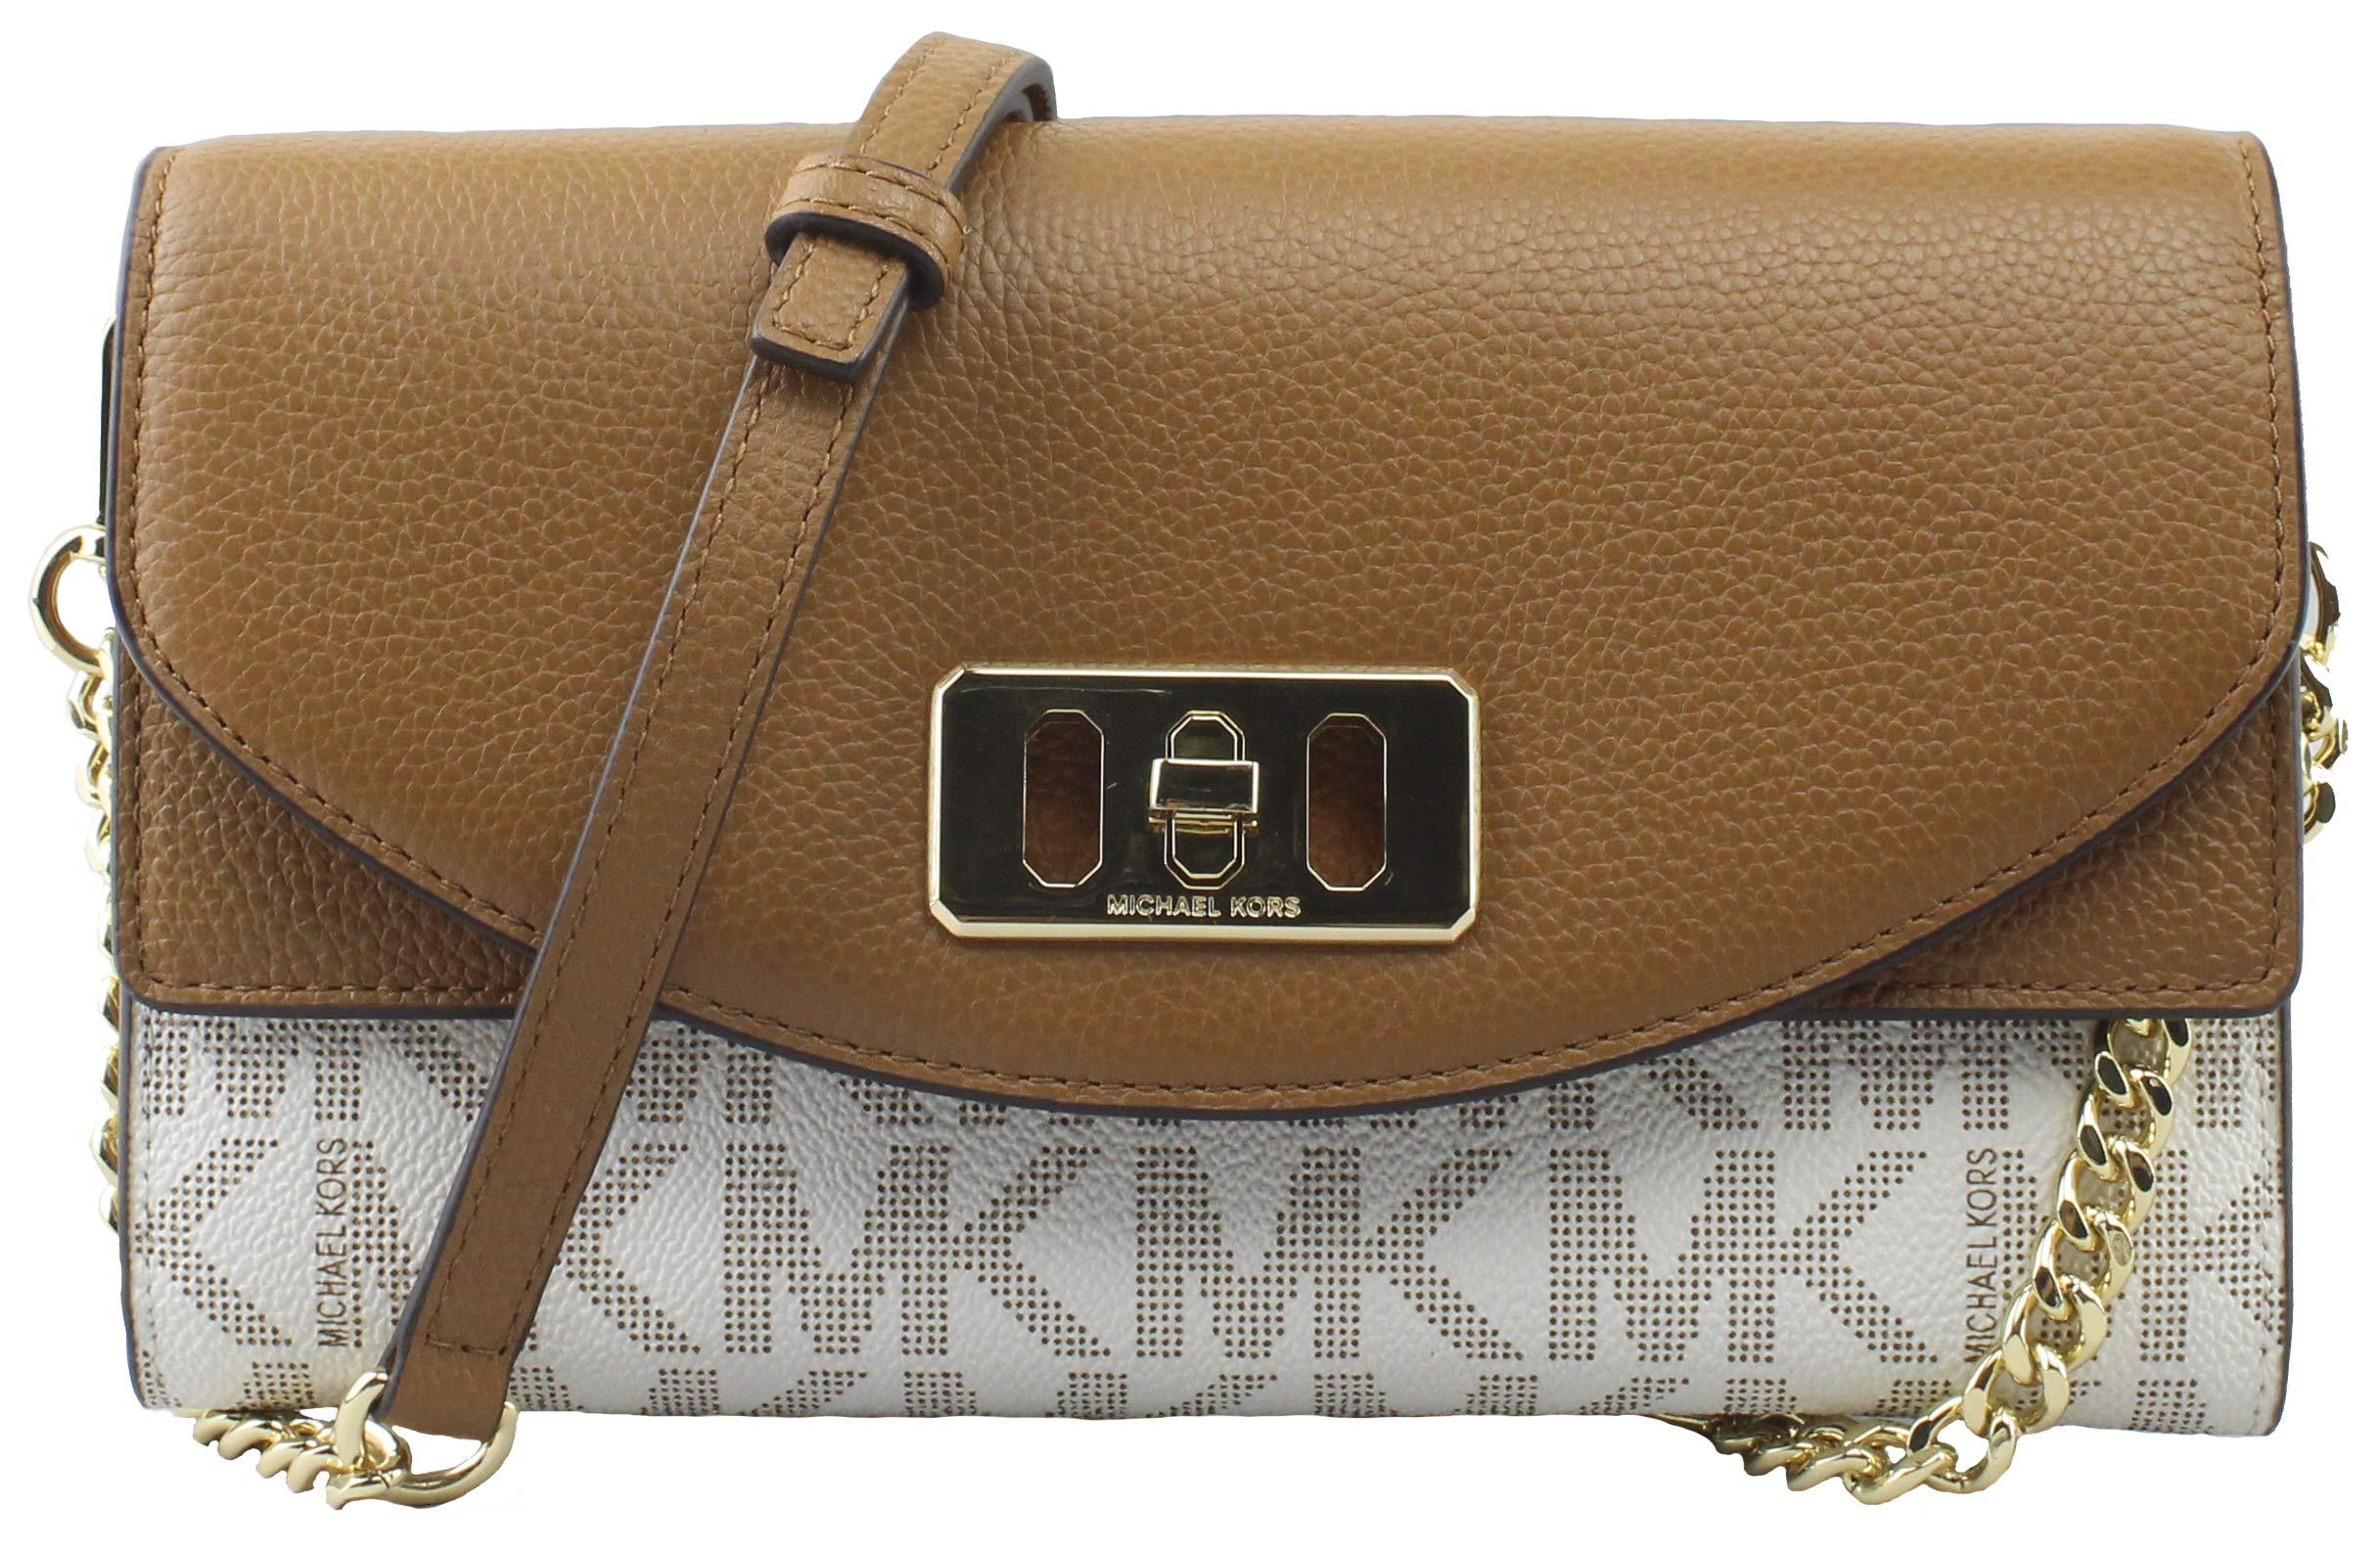 Michael Kors Karson Wallet Clutch Leather Vanilla/Acrn (35T8GKRC7B)